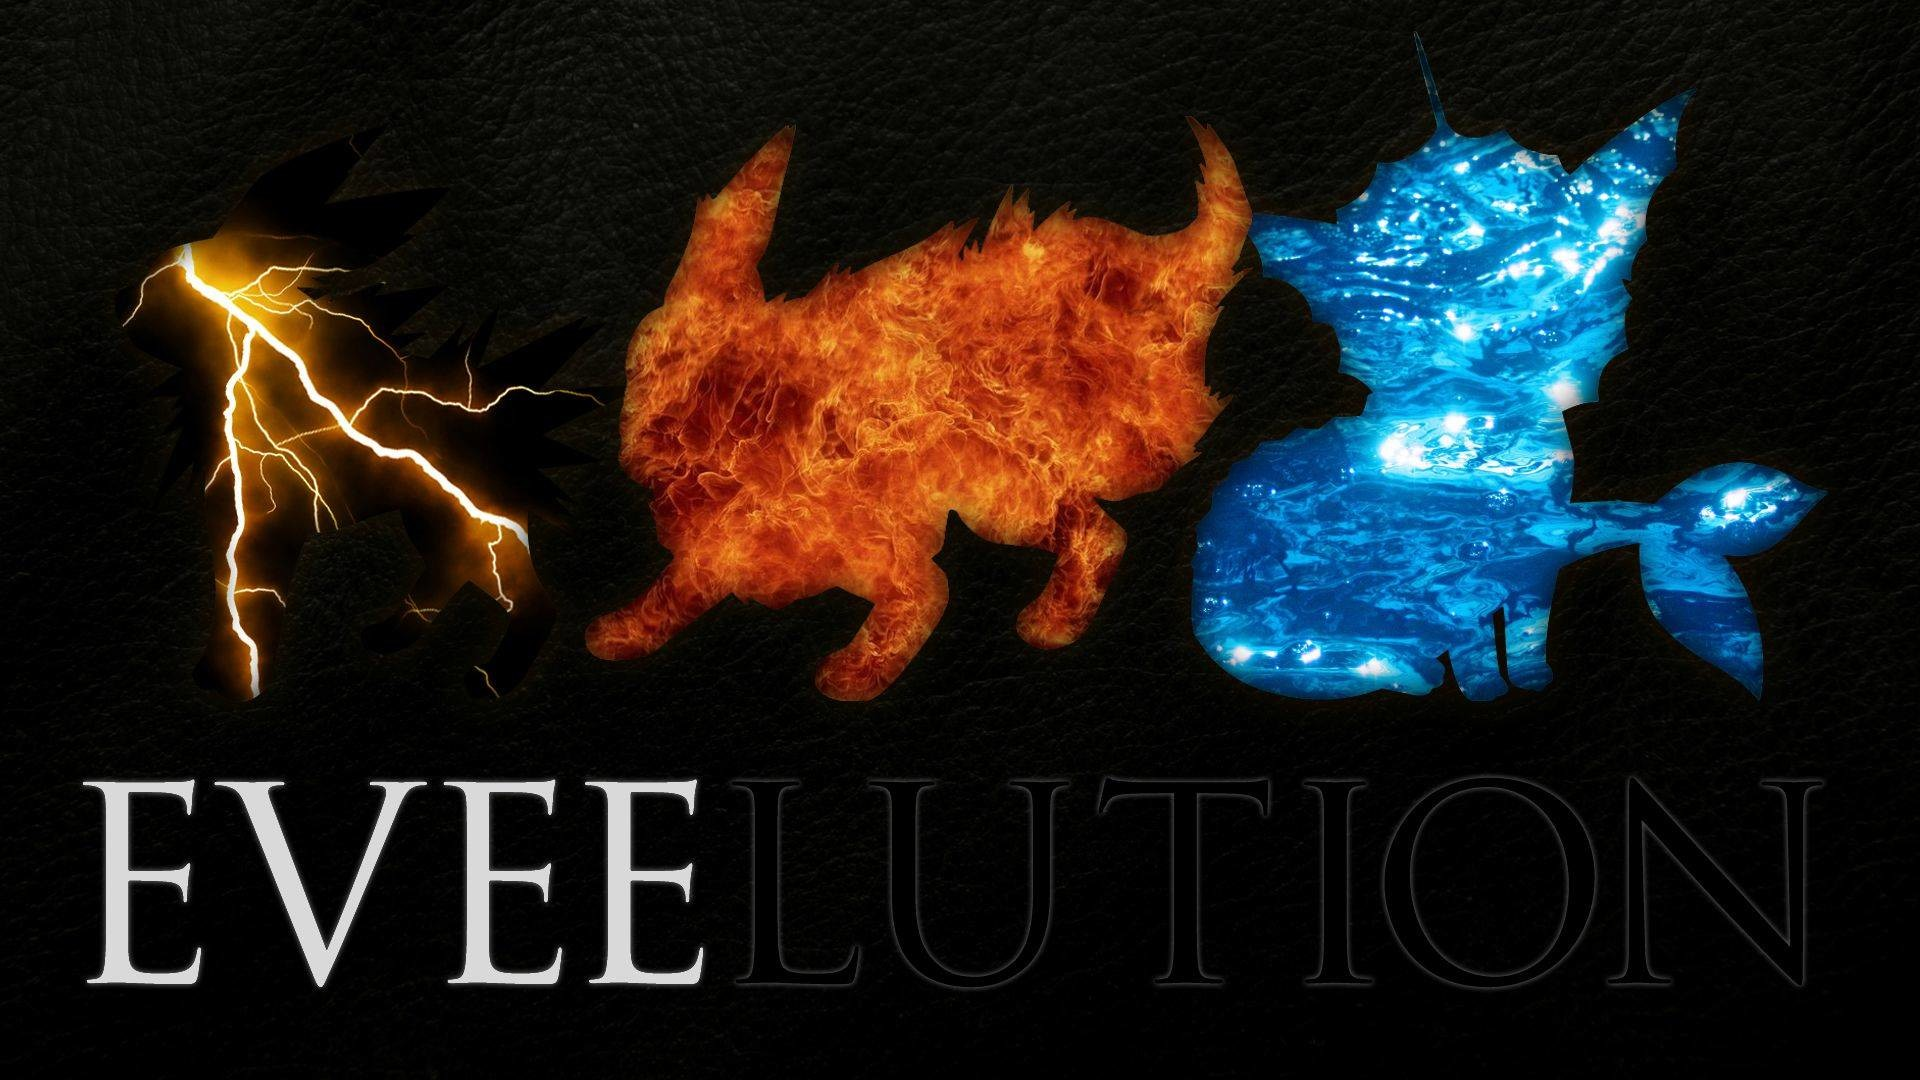 Eevee evolution chain – Pokemon Wallpaper